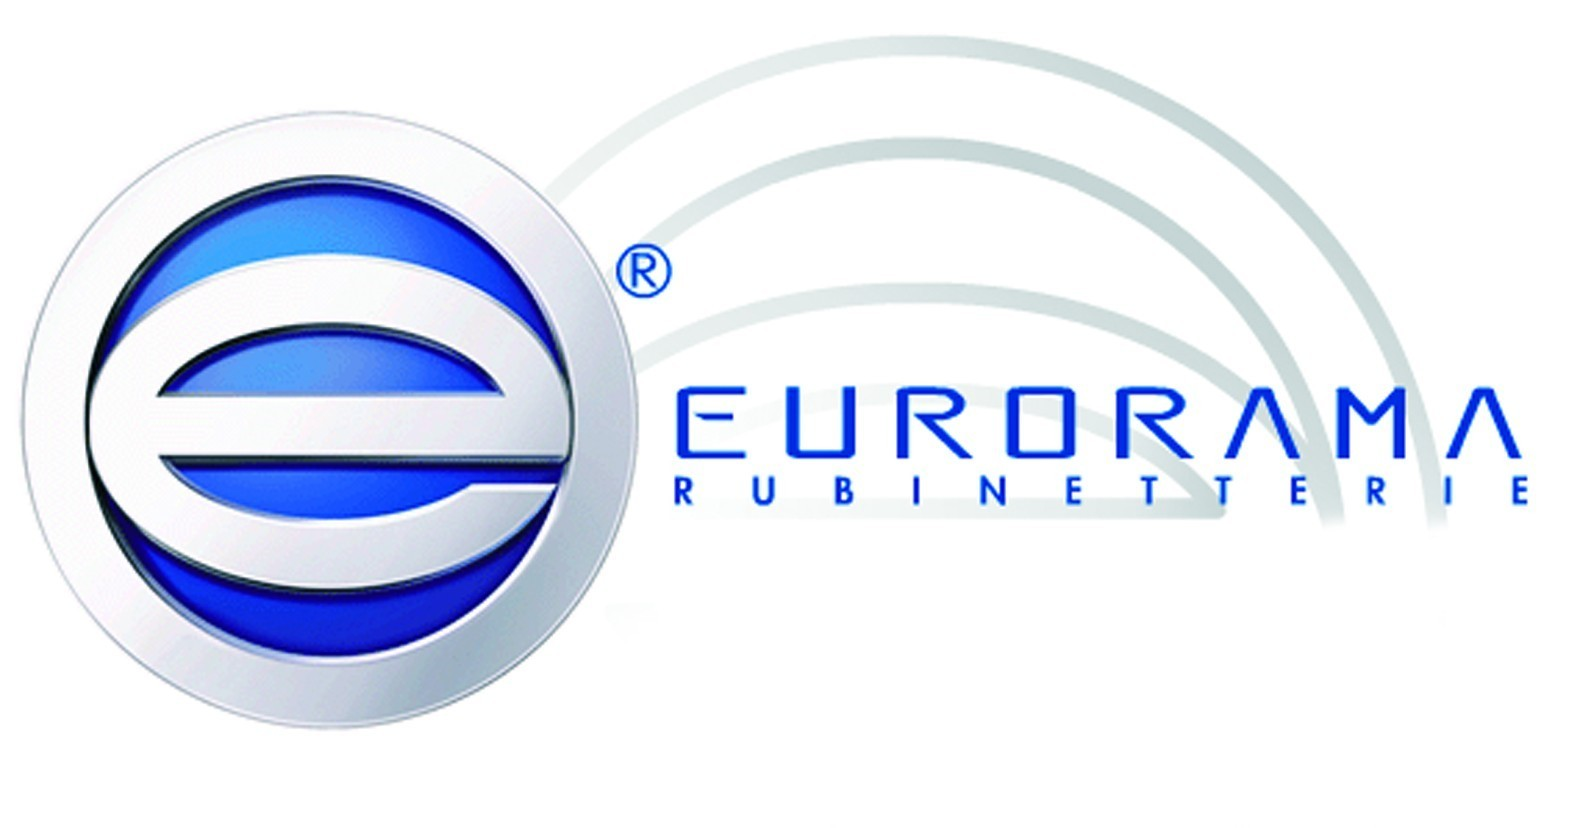 RUBINETTERIA EURORAMA